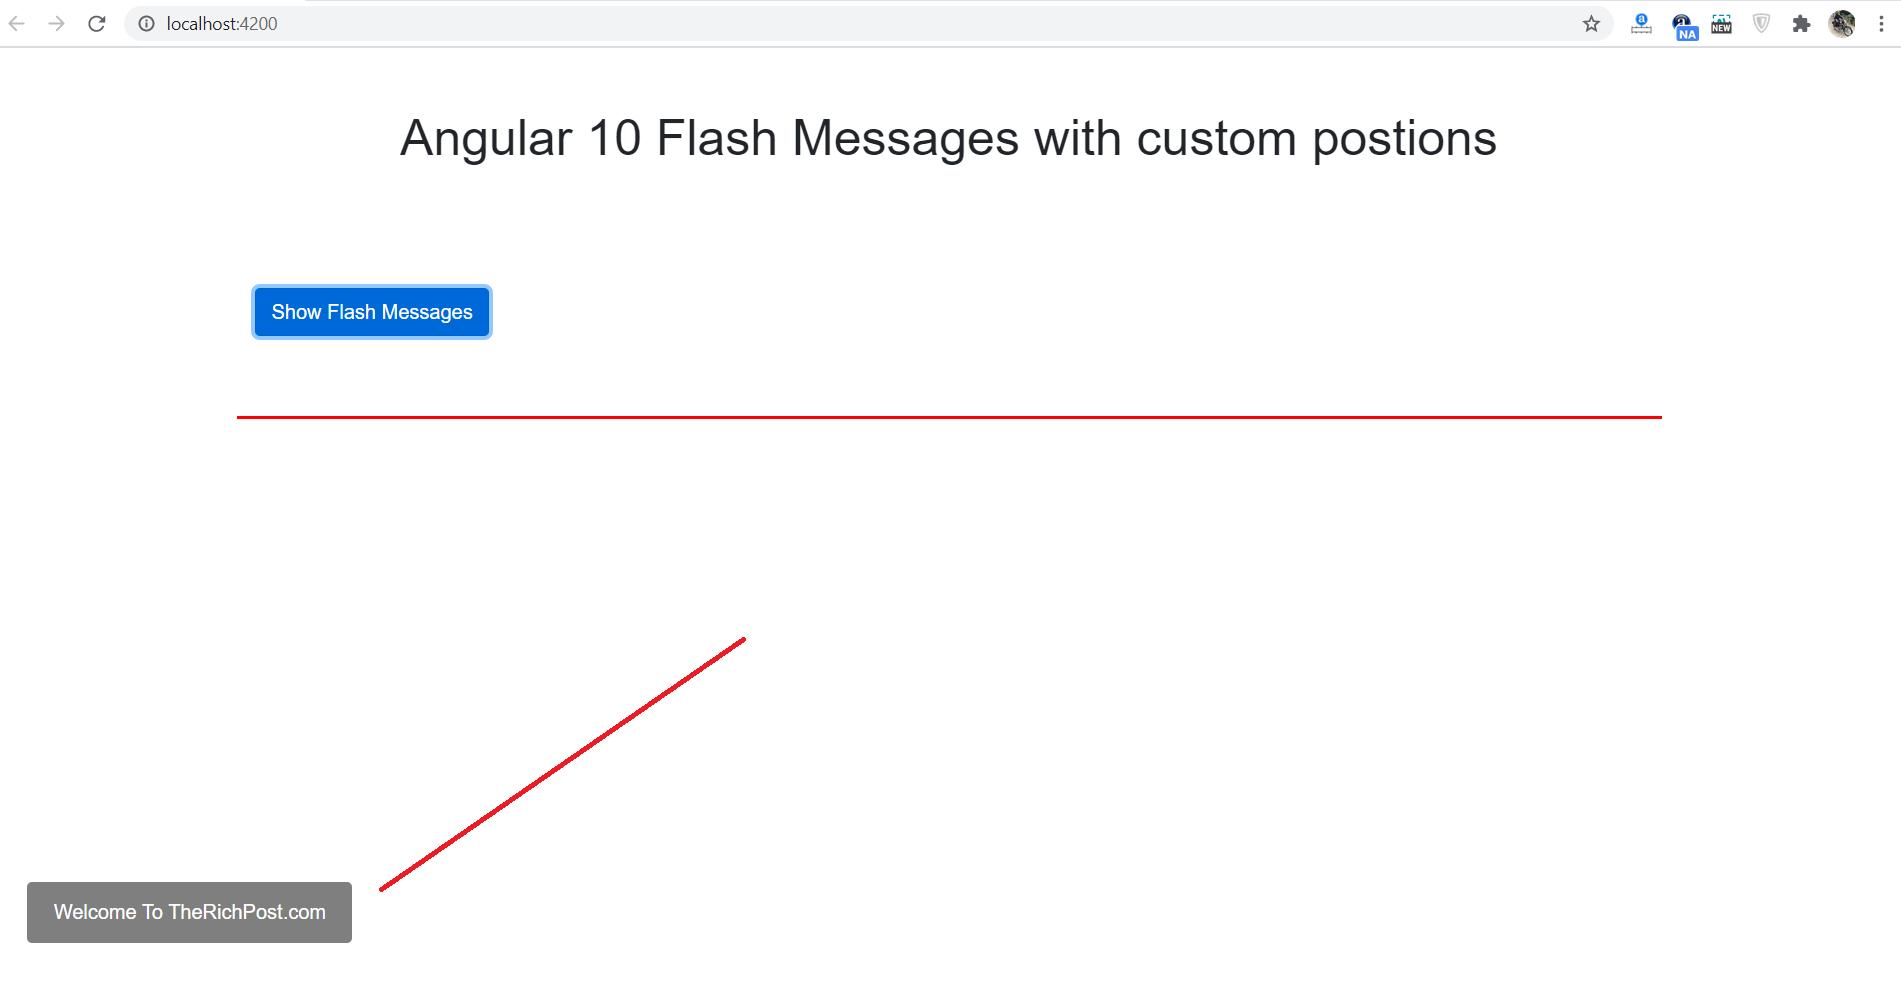 Angular 10 Flash Message with Customization